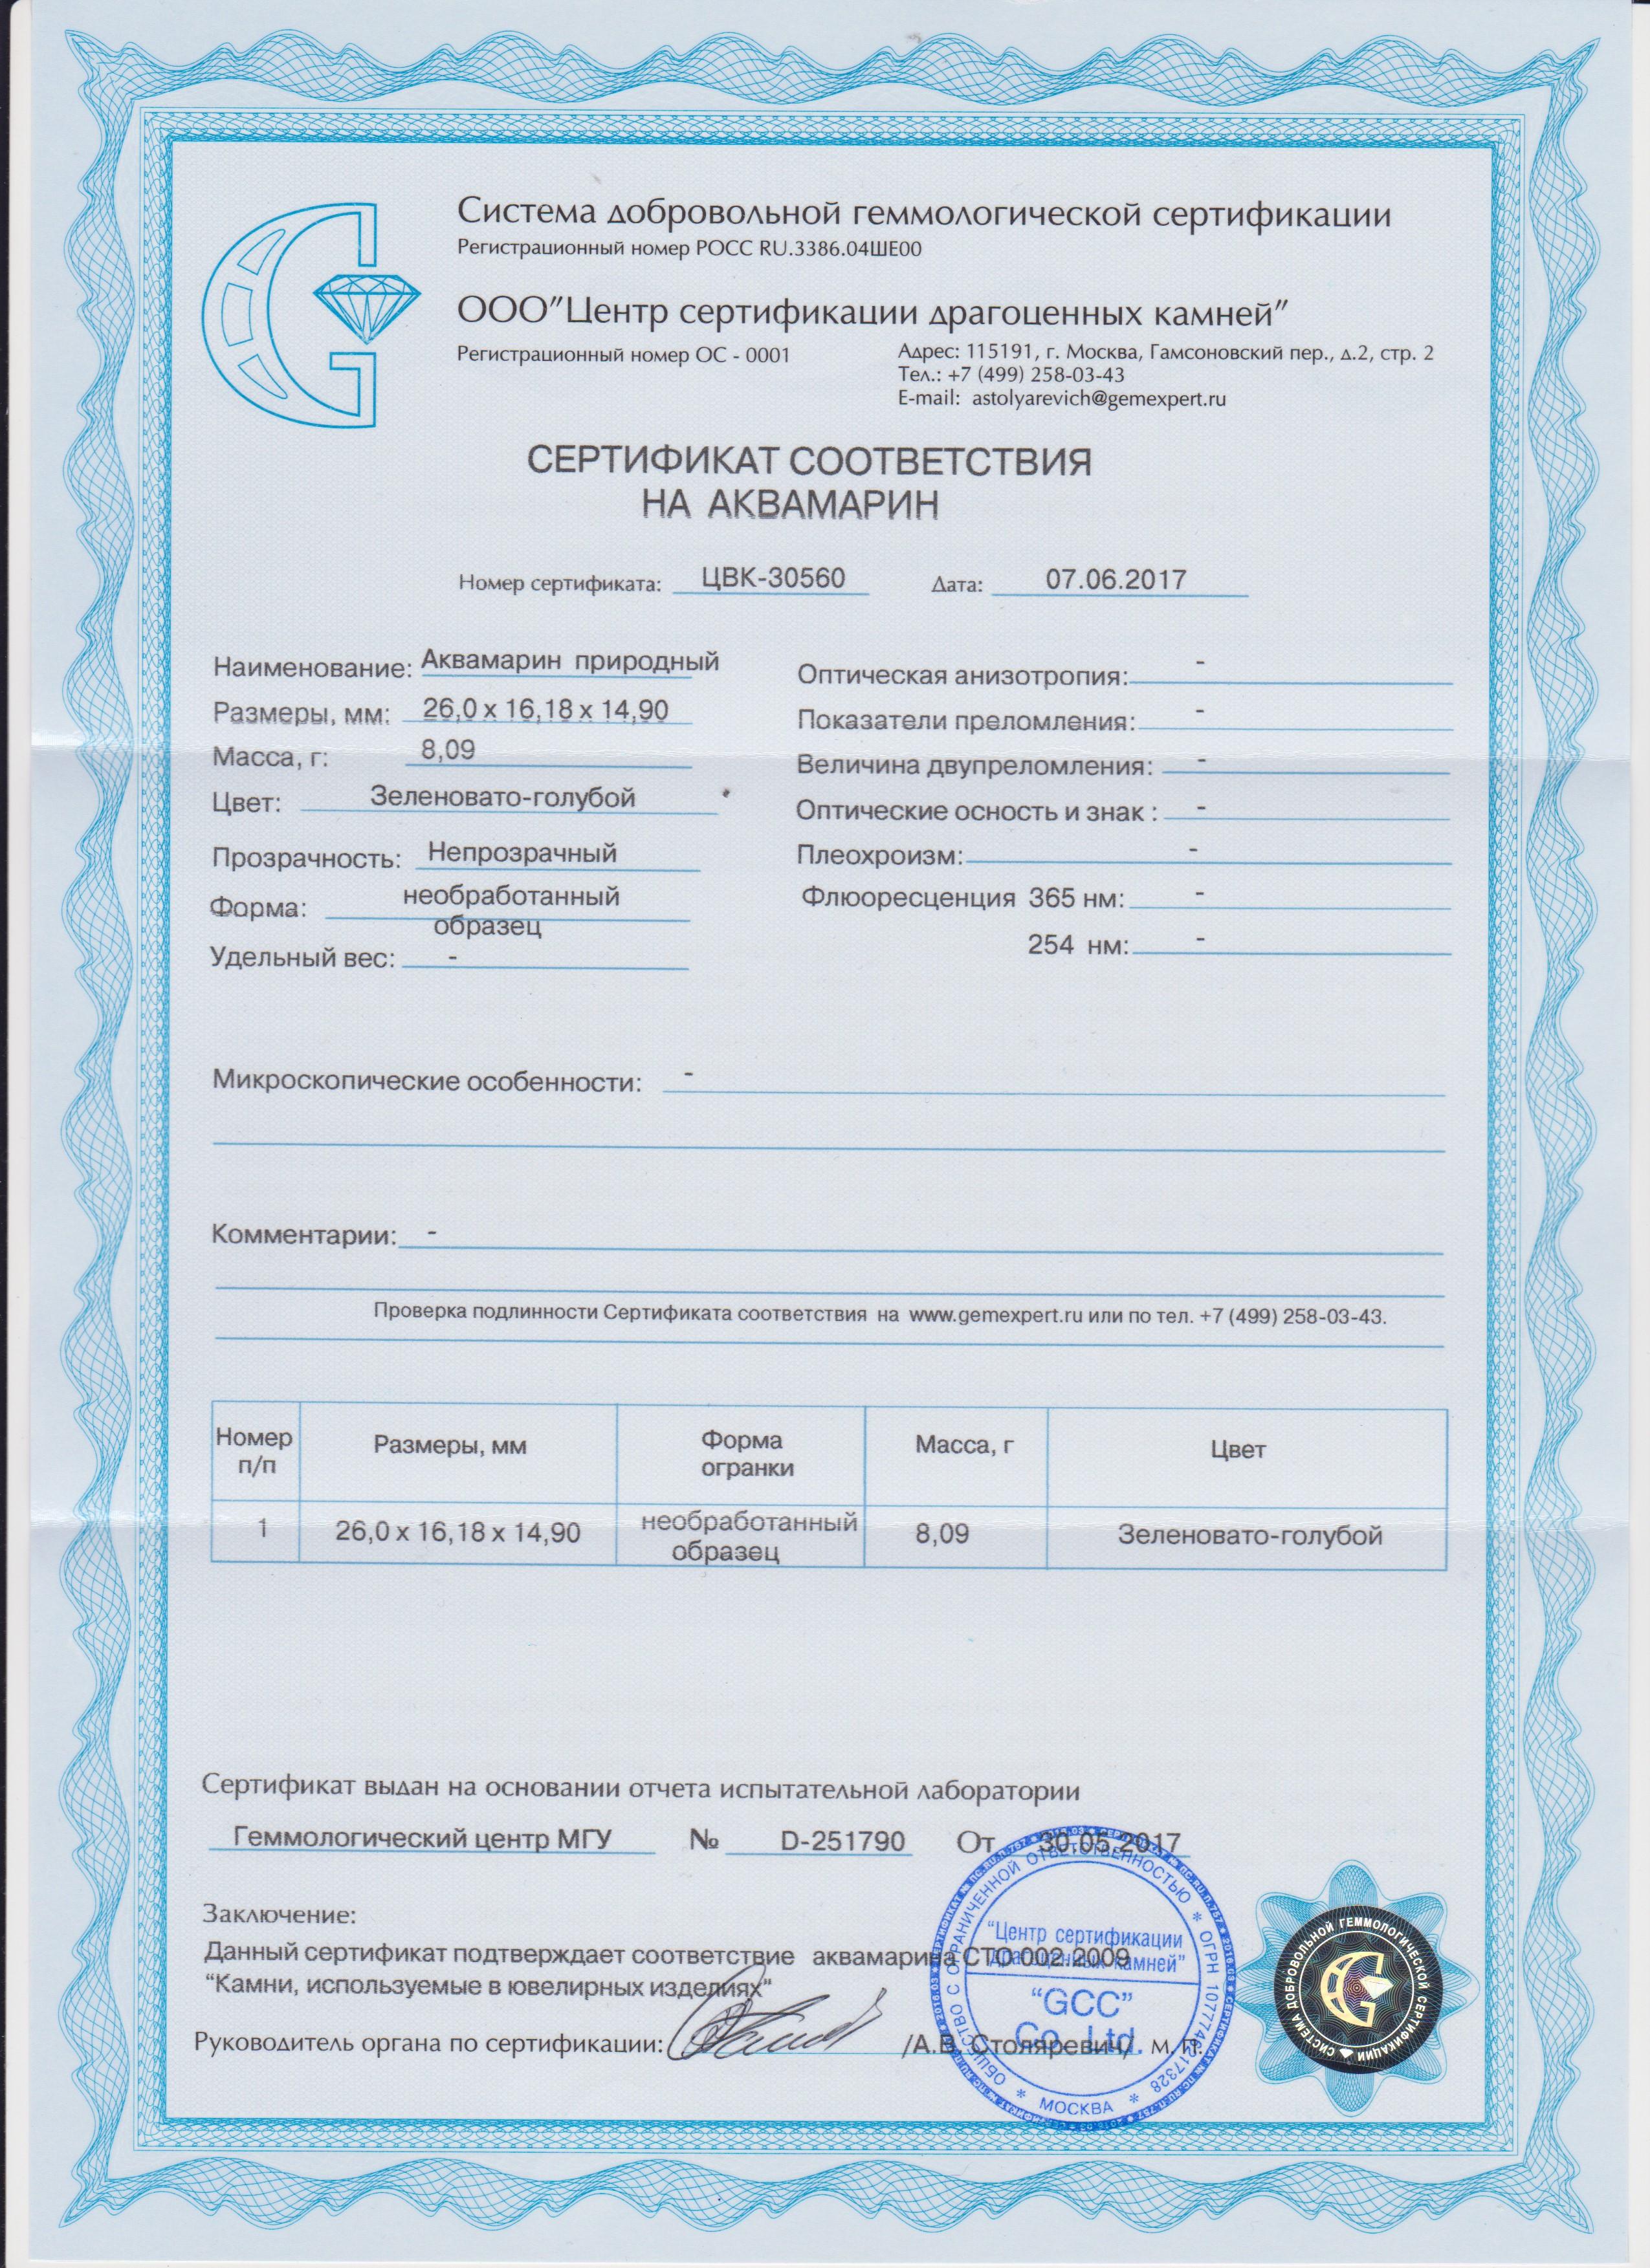 https://mineralmarket.ru/img/certificate/4/1497884009.jpg